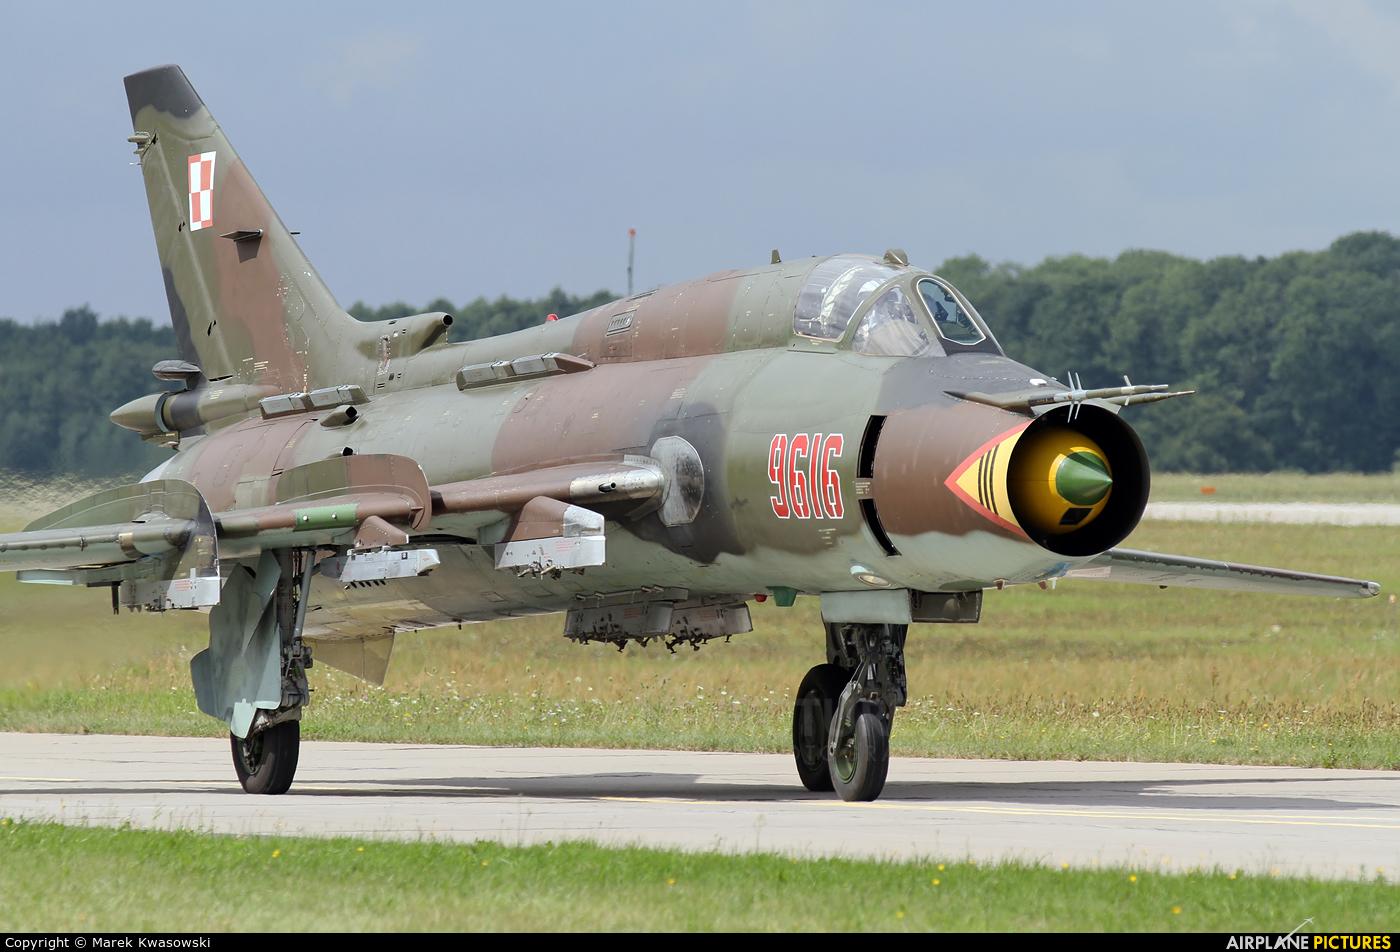 Poland - Air Force 9616 aircraft at Mińsk Mazowiecki